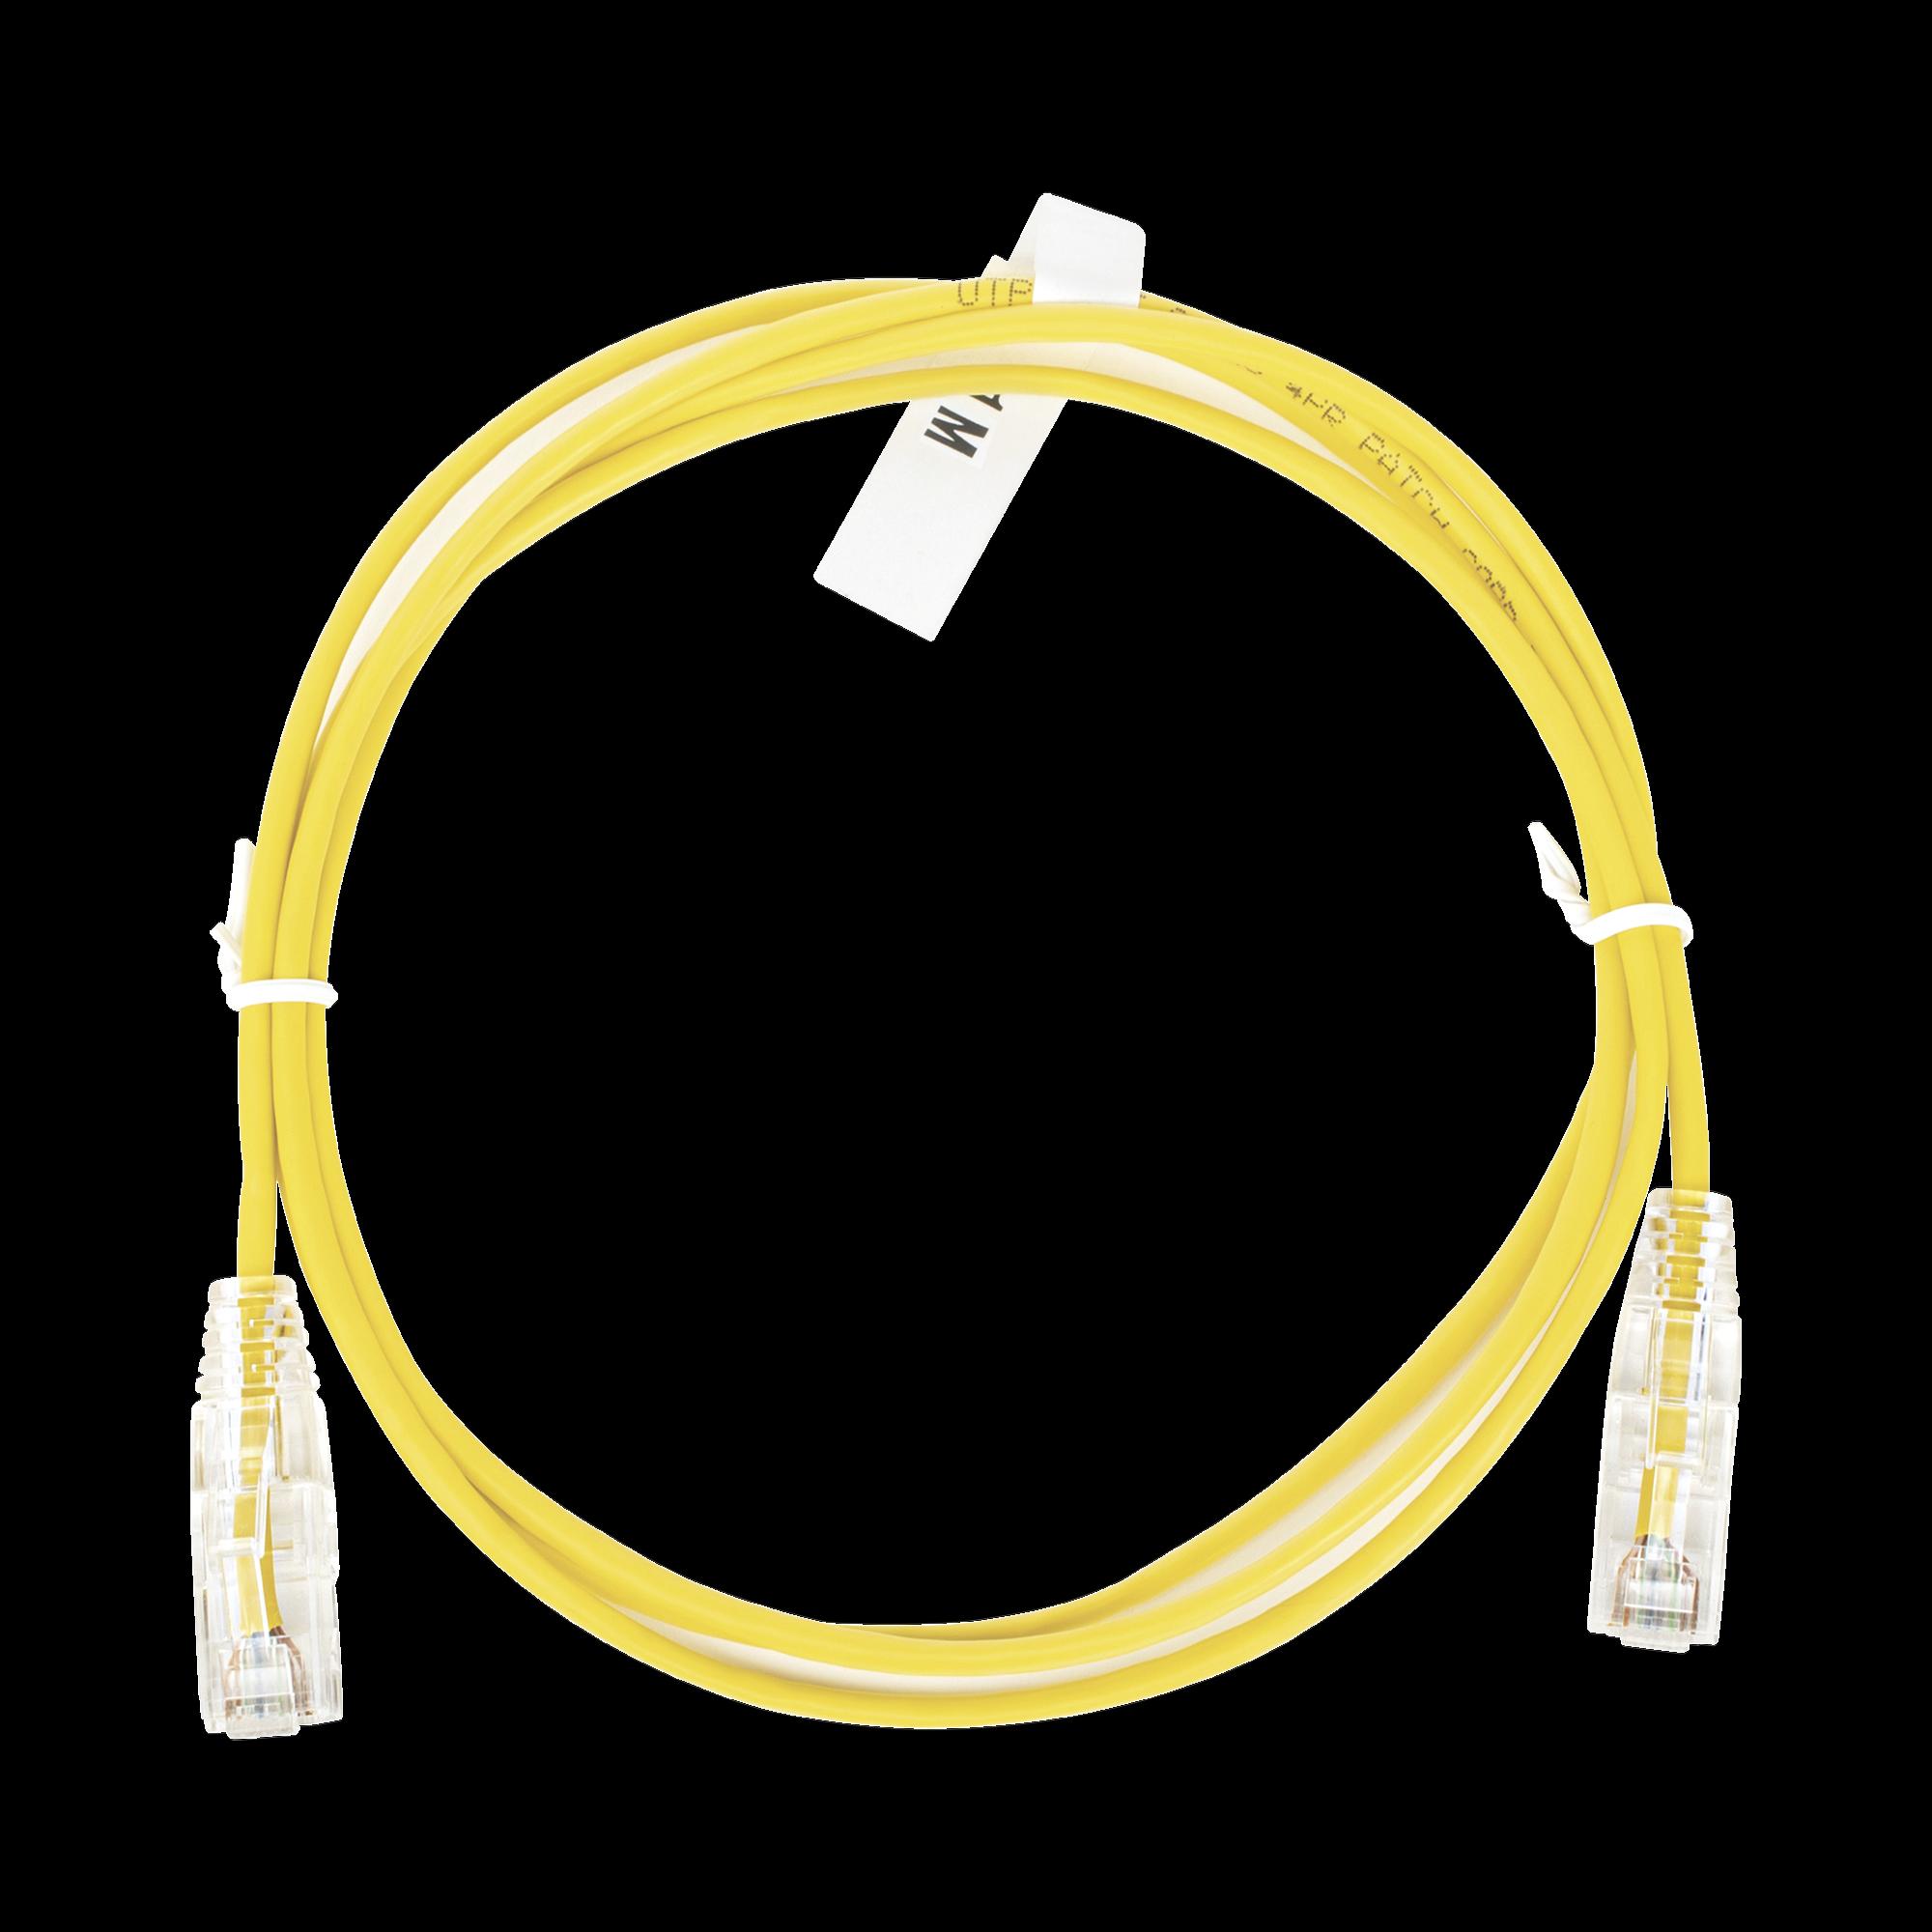 Cable de Parcheo Slim UTP Cat6 - 1 metro, Amarillo, Diámetro Reducido (28 AWG)